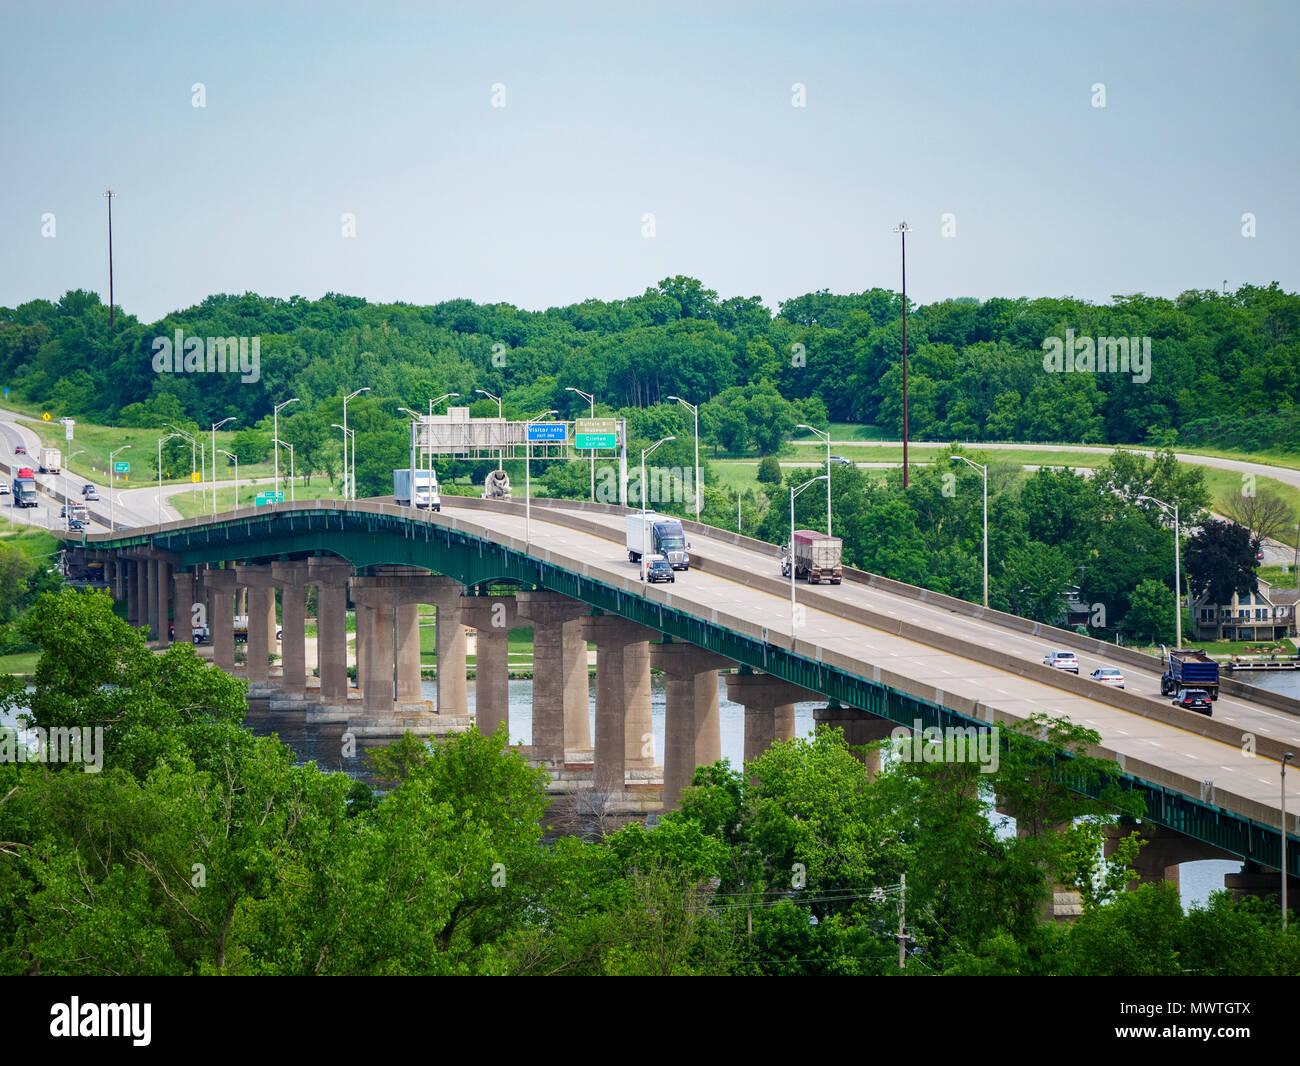 Interstate 80 Mississippi River Bridge between Iowa and Illinois